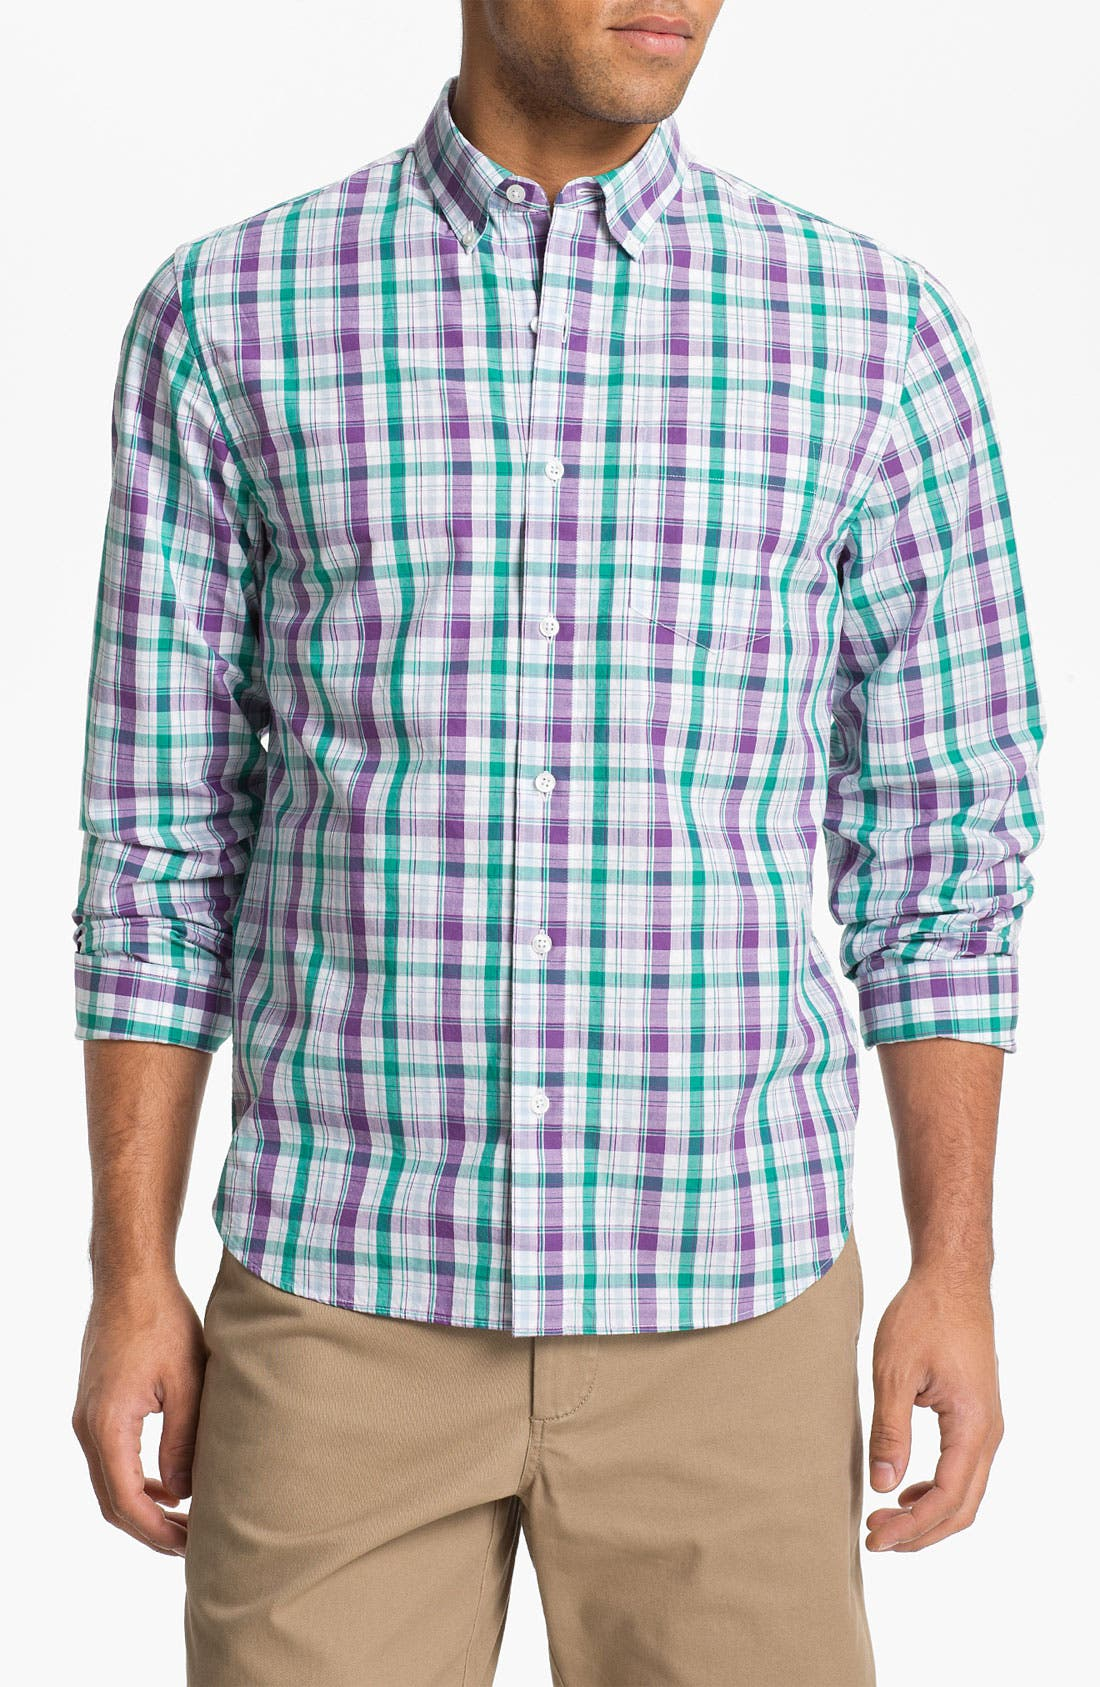 Alternate Image 1 Selected - Bonobos 'Rickey' Standard Fit Sport Shirt